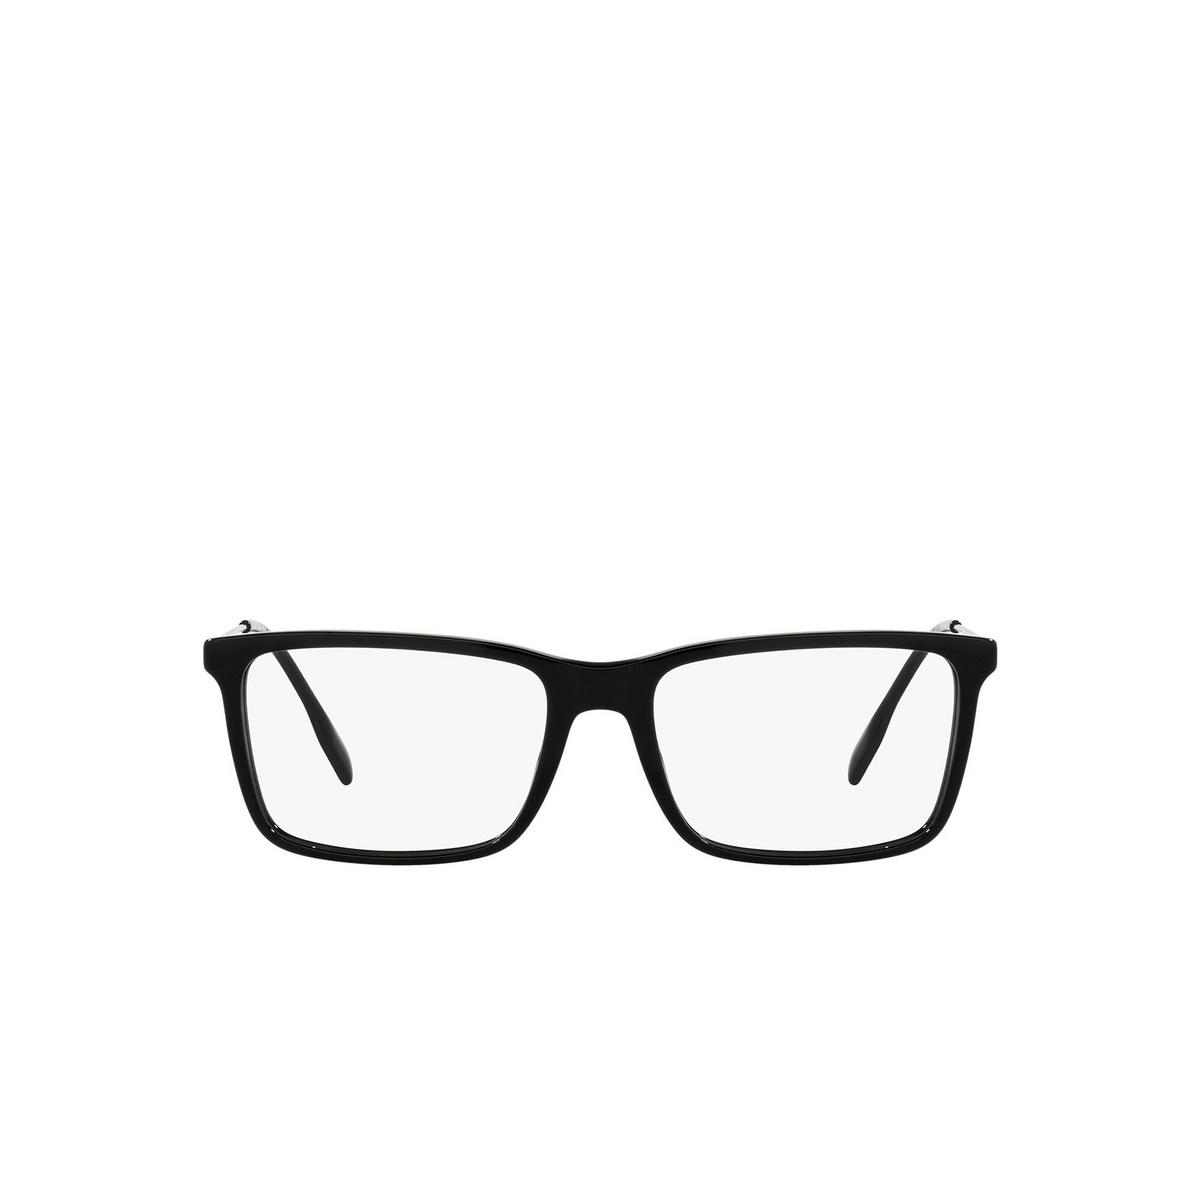 Burberry® Rectangle Eyeglasses: Harrington BE2339 color Black 3001 - front view.